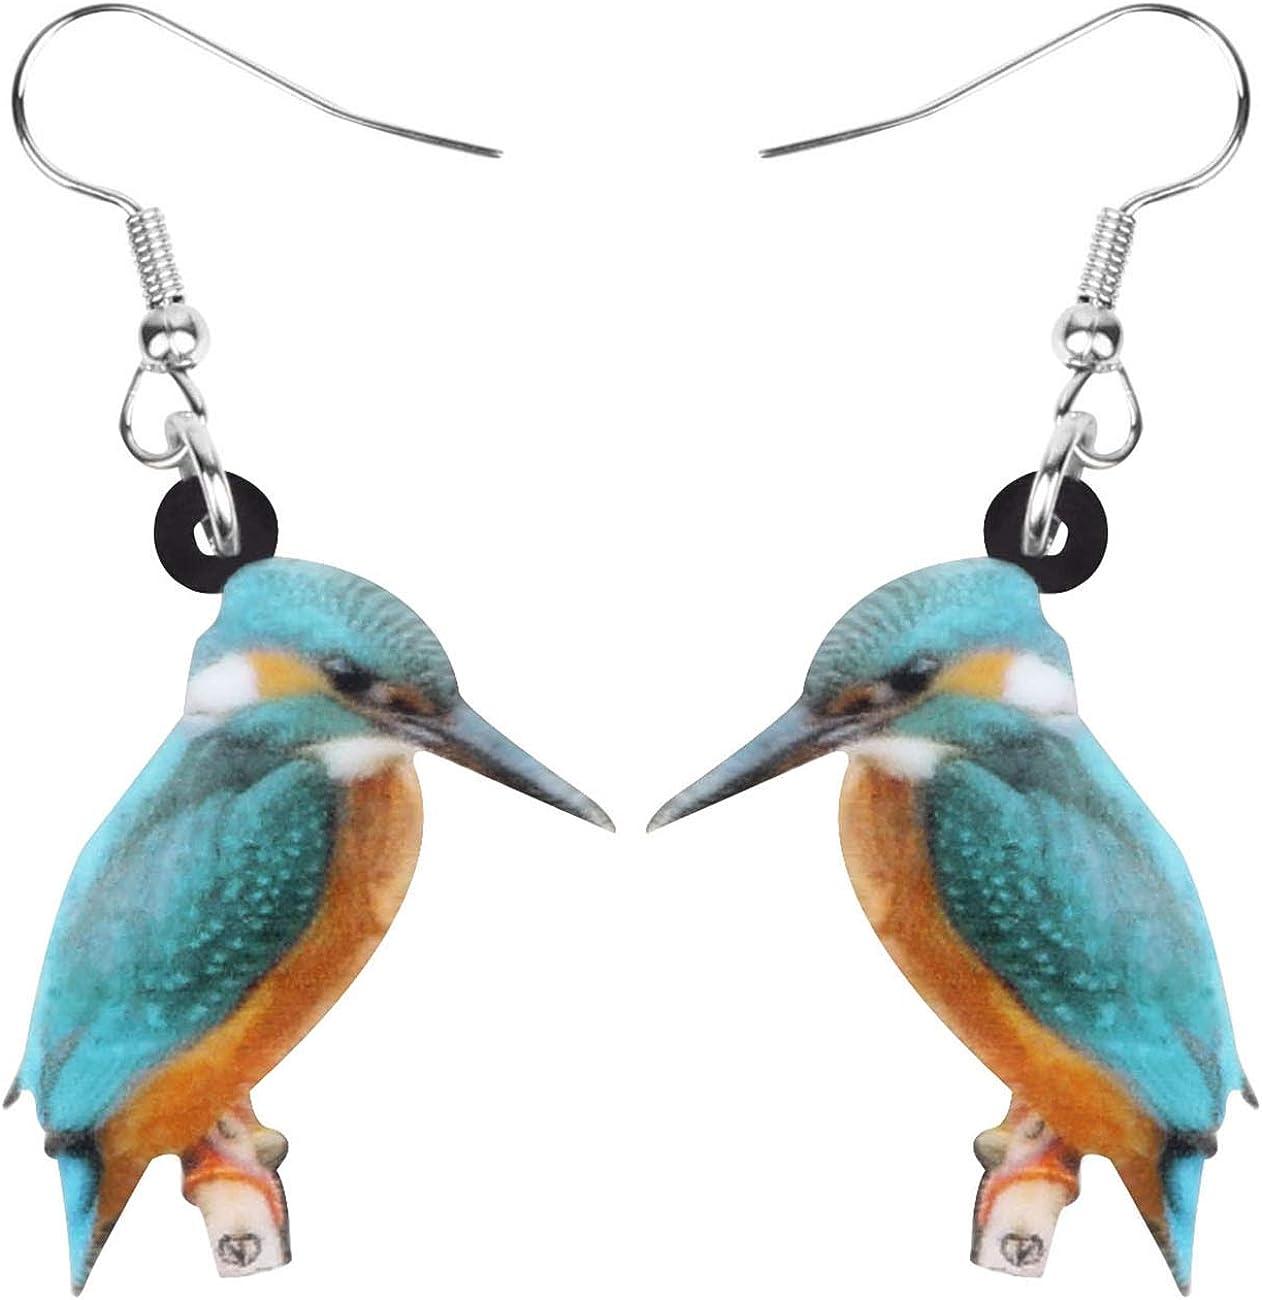 NEWEI Acrylic Blue Kingfisher Bird Earrings Dangle Drop Printing Aesthetic Animal Jewelry For Women Girls Teen Charm Gifts